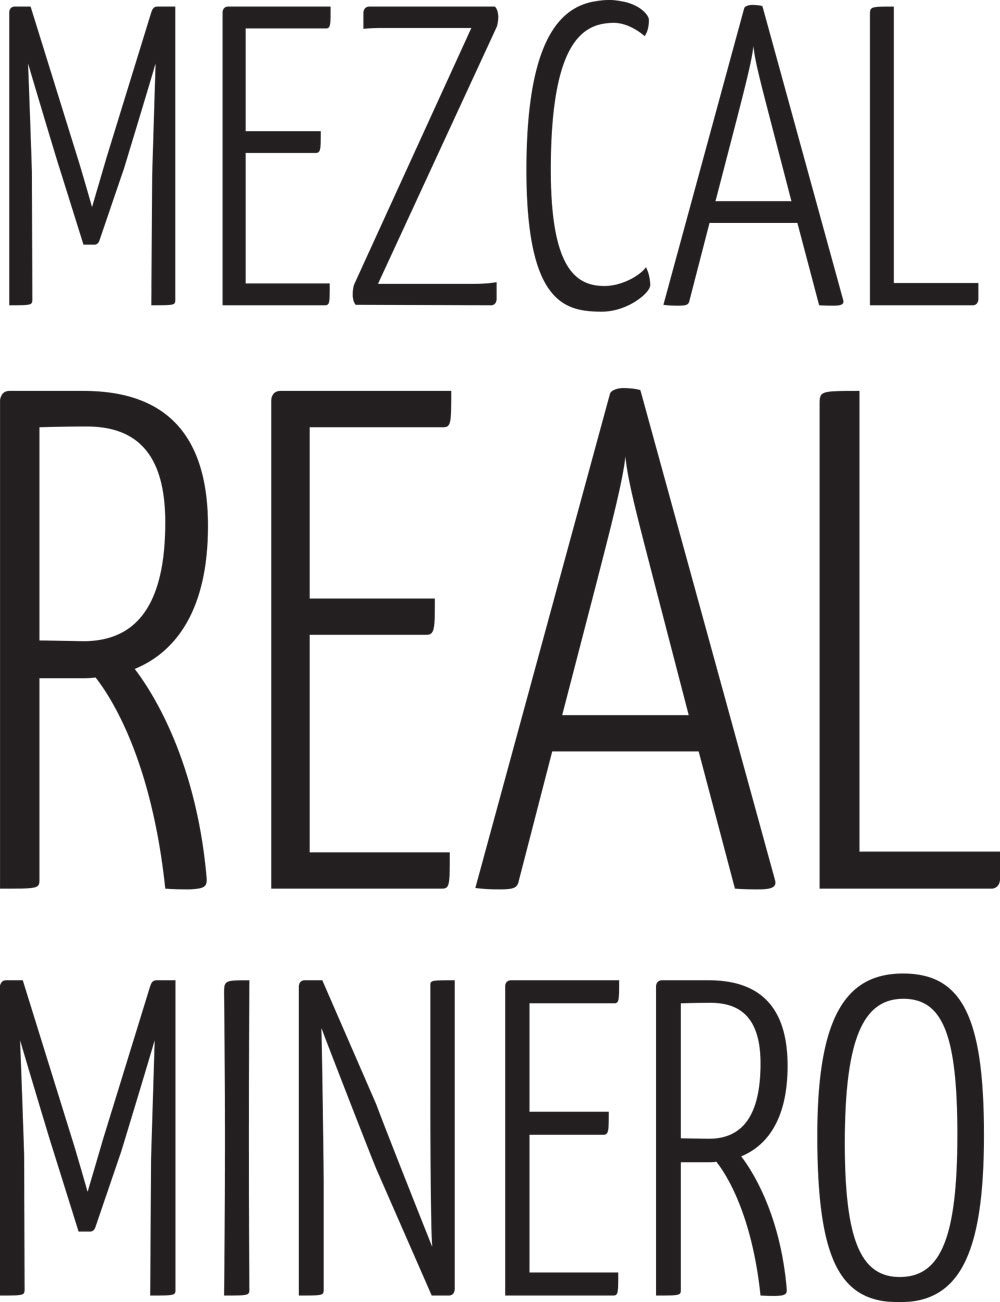 Mezcal-Real-Minero-Logo.jpg